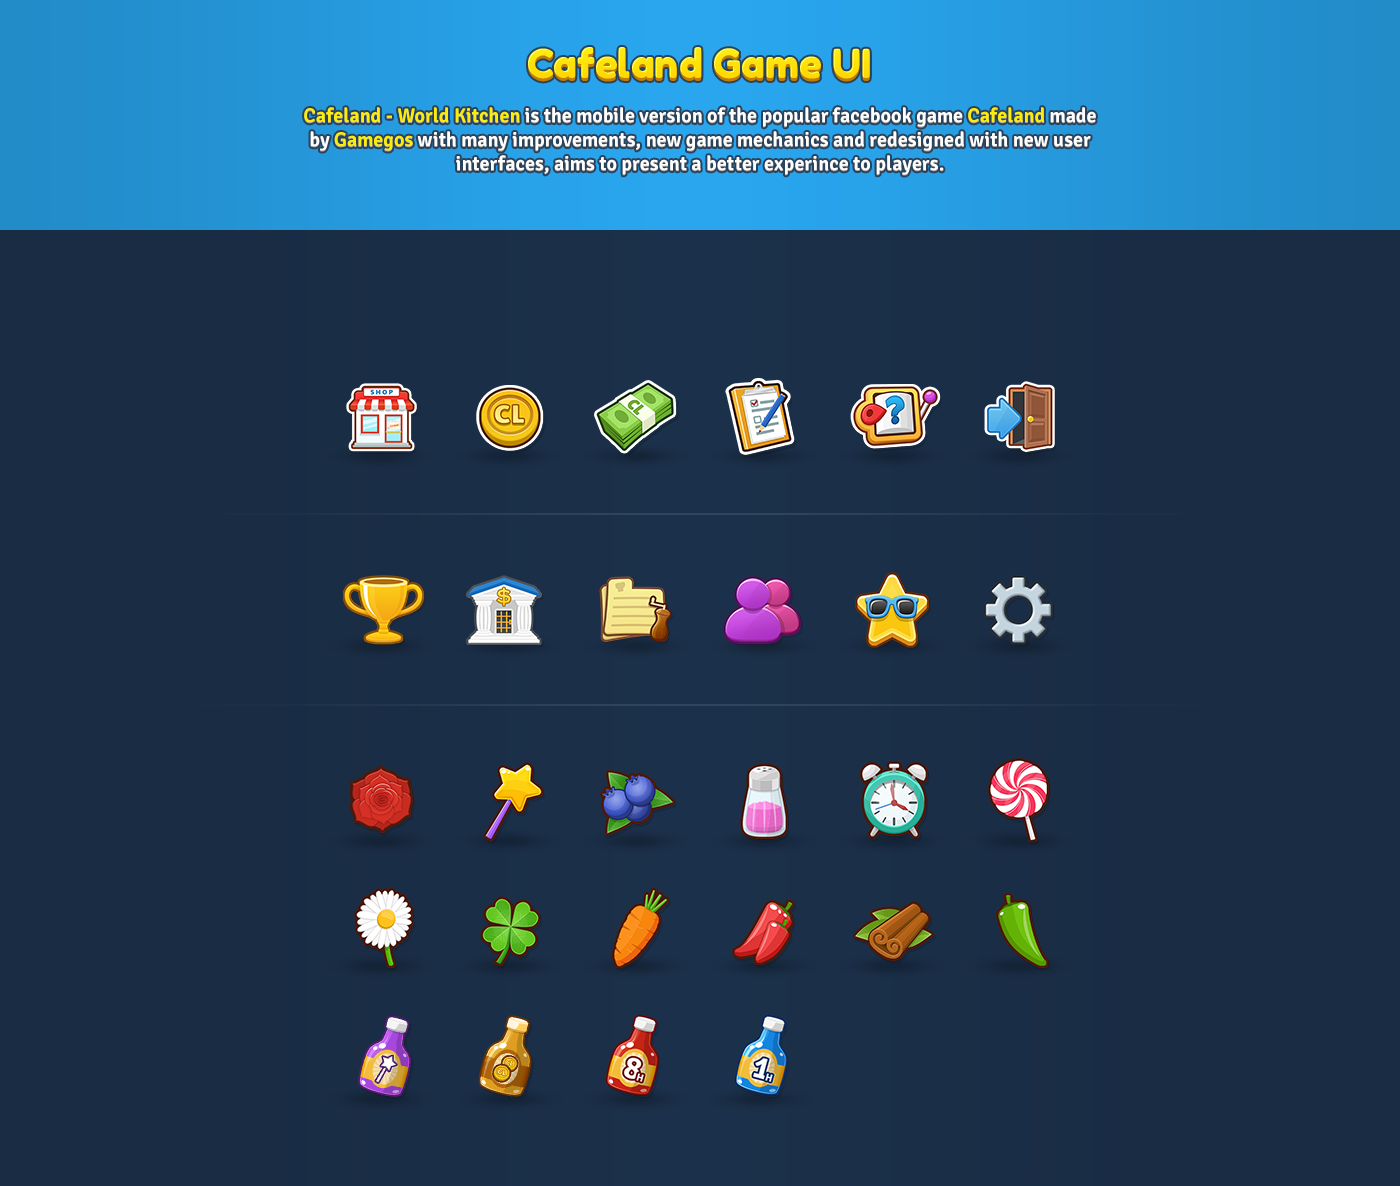 Cafeland - World Kitchen Game UI on Behance